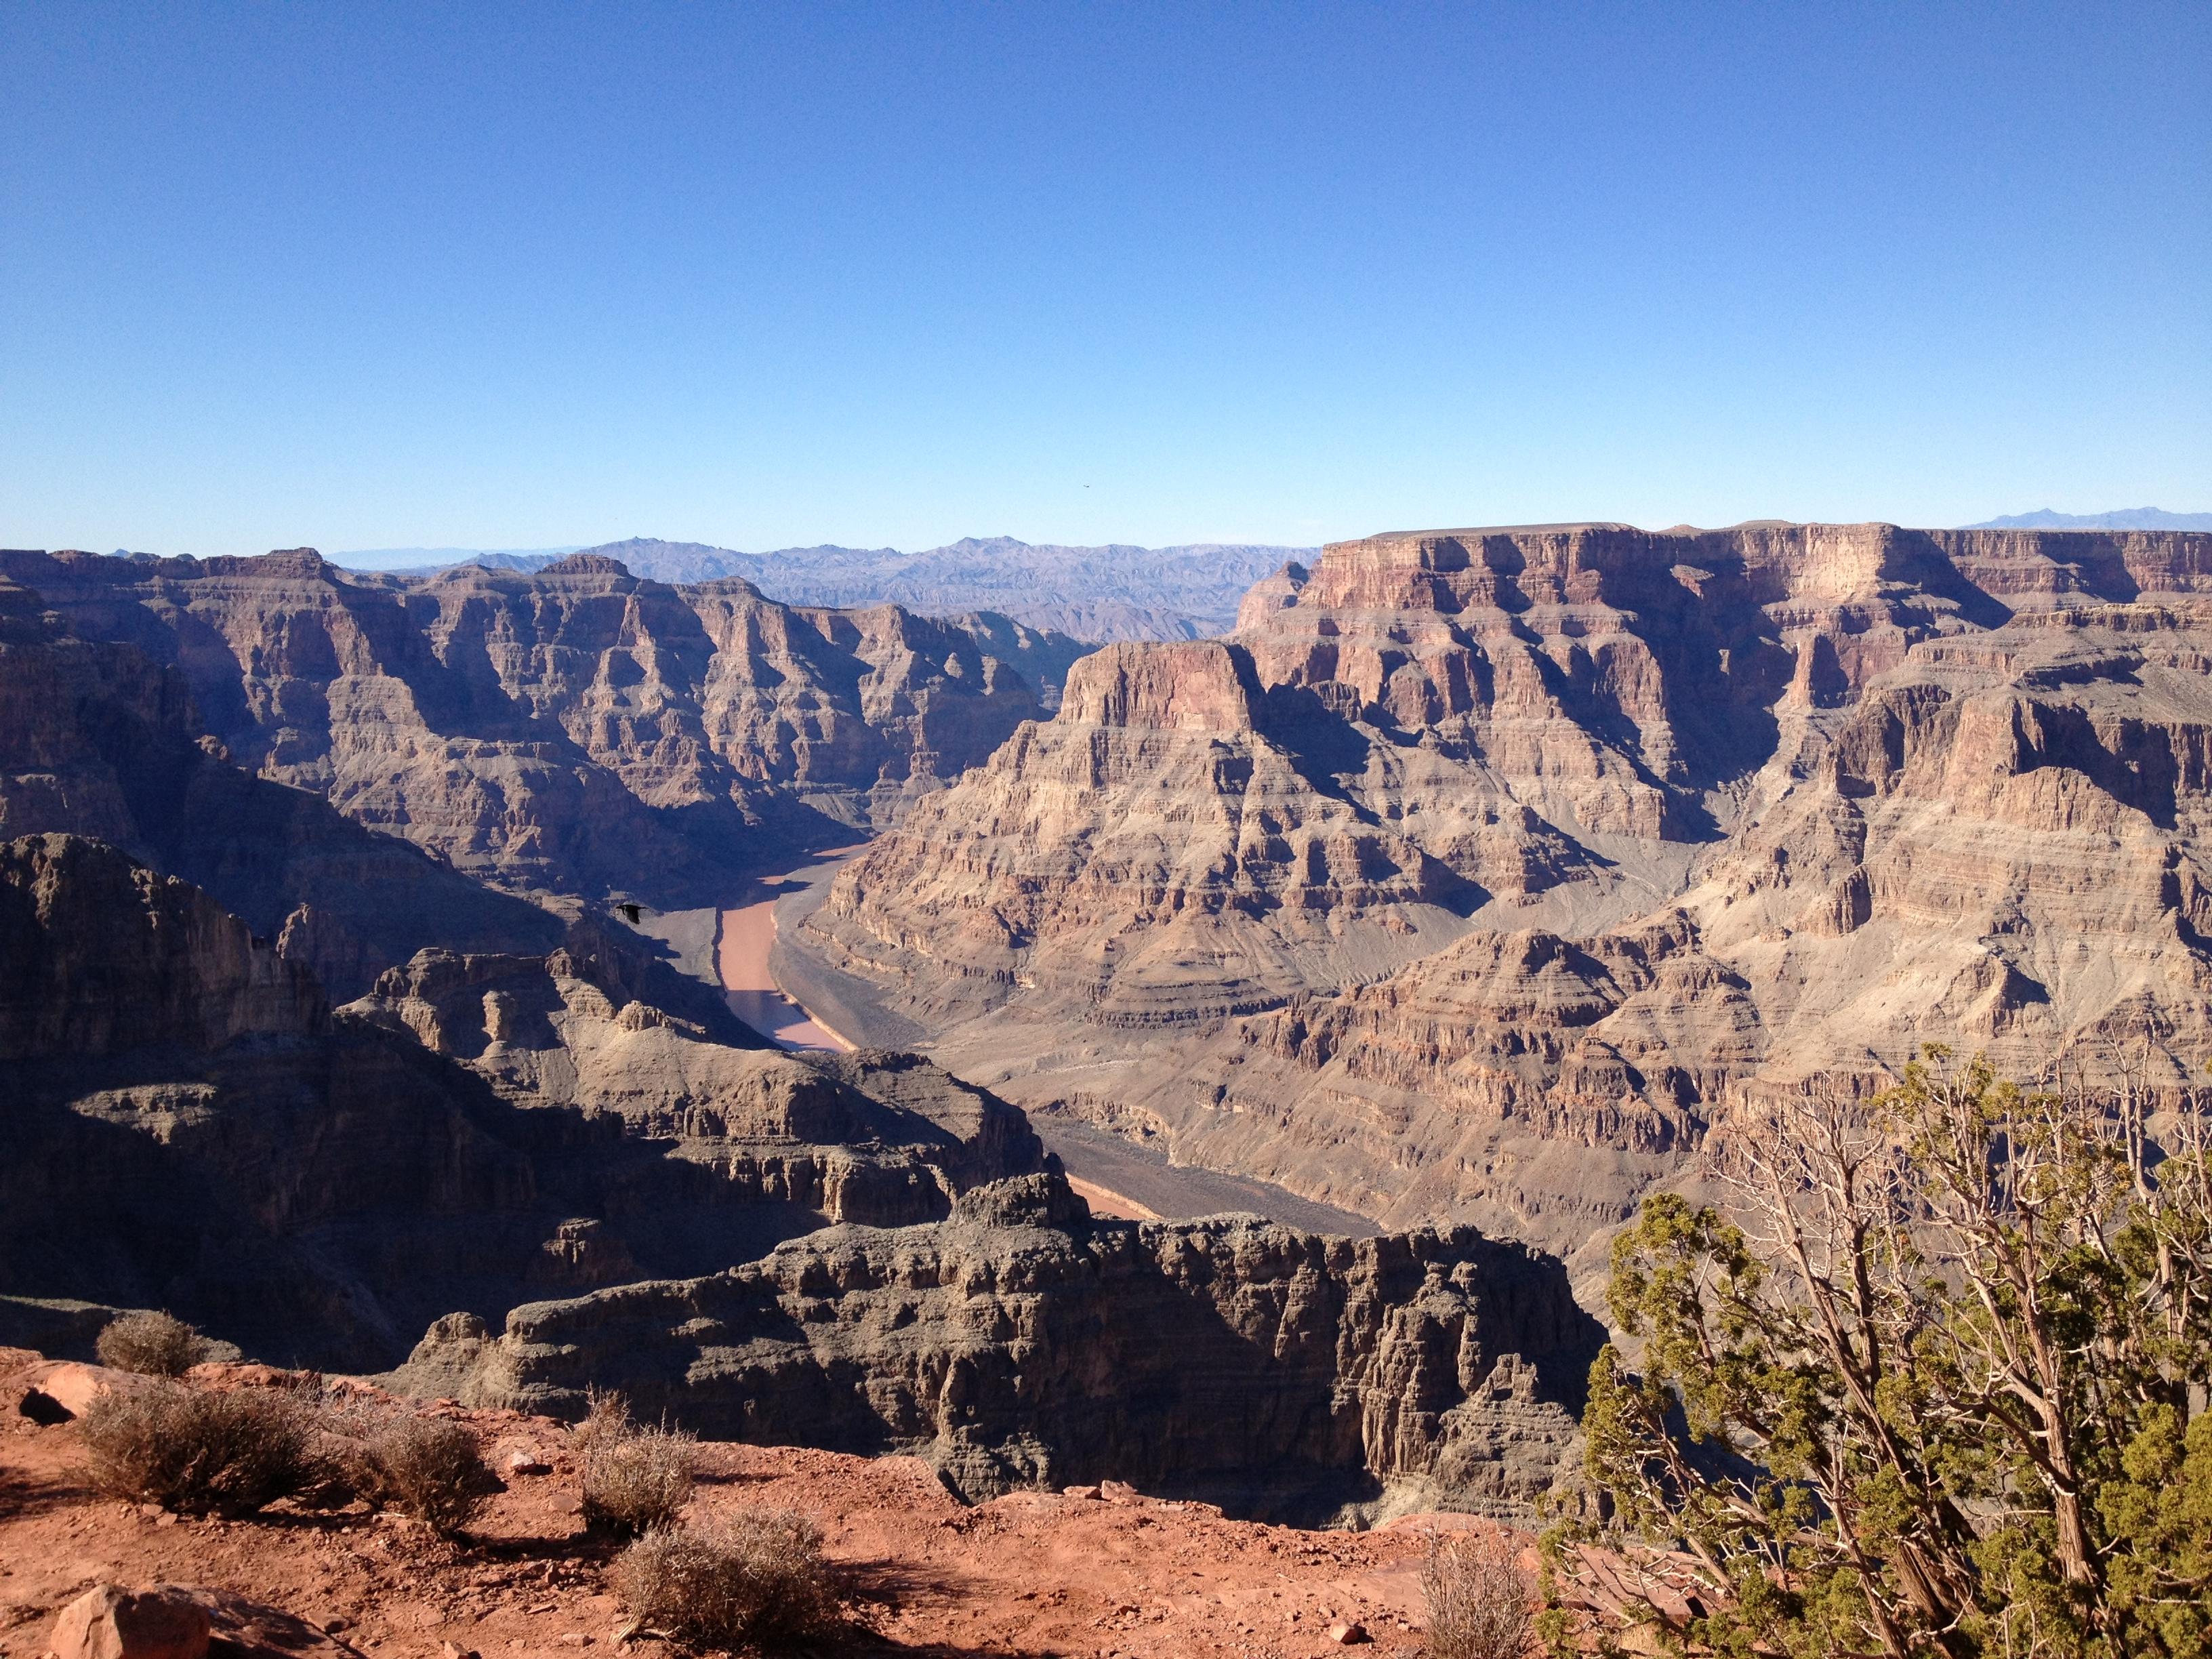 File:Colorado River Grand Canyon West Rim.JPG - Wikimedia Commons